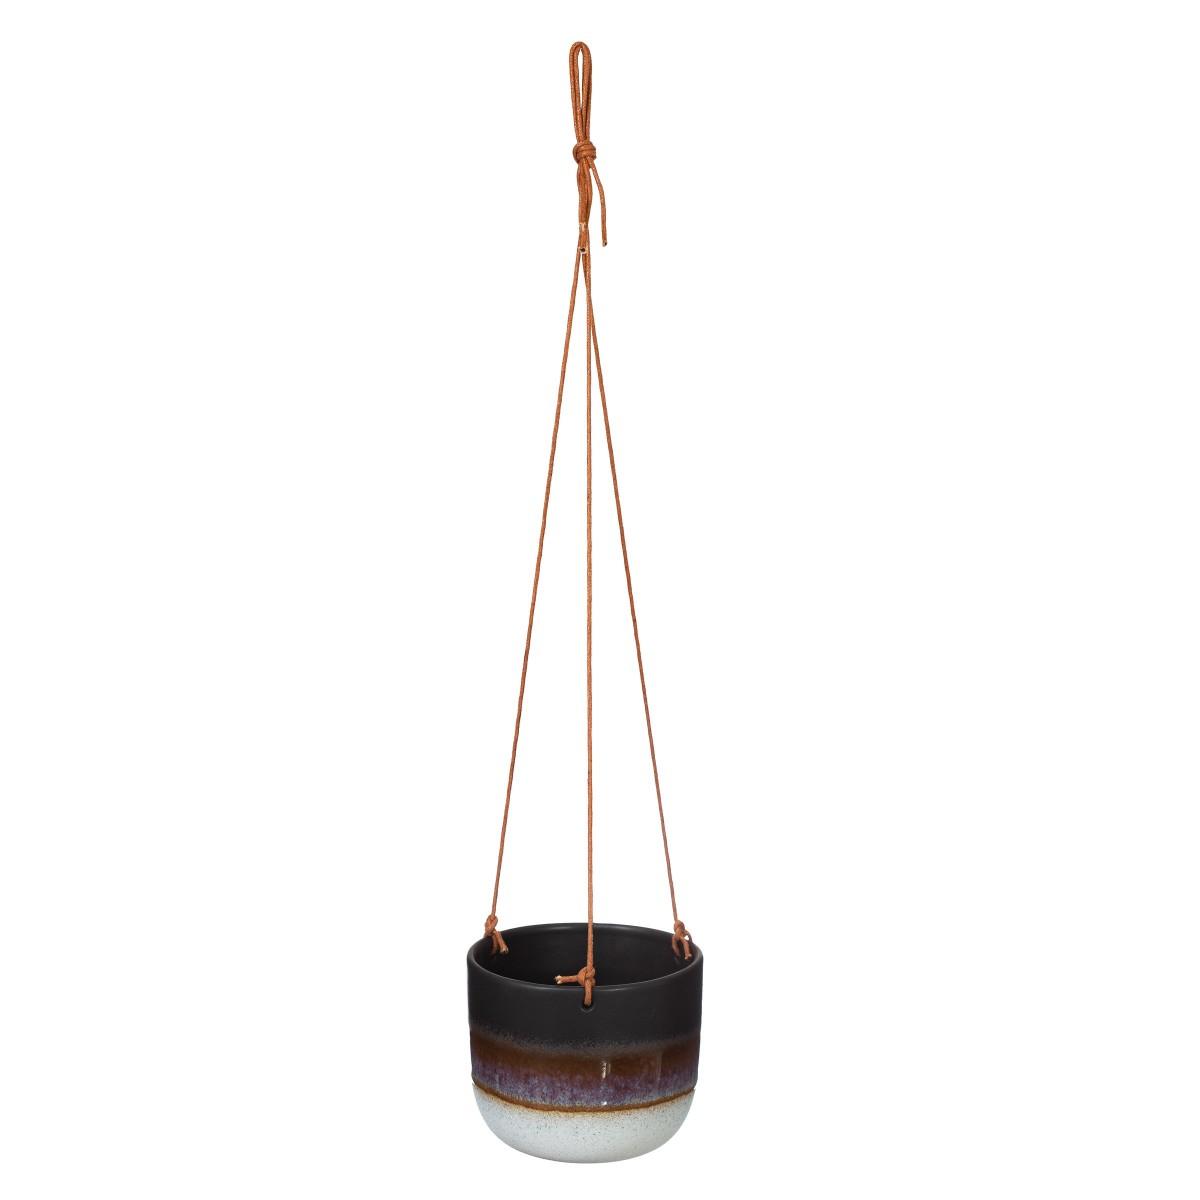 Plantenkamer-Mojave-Black-Hanging-Planter